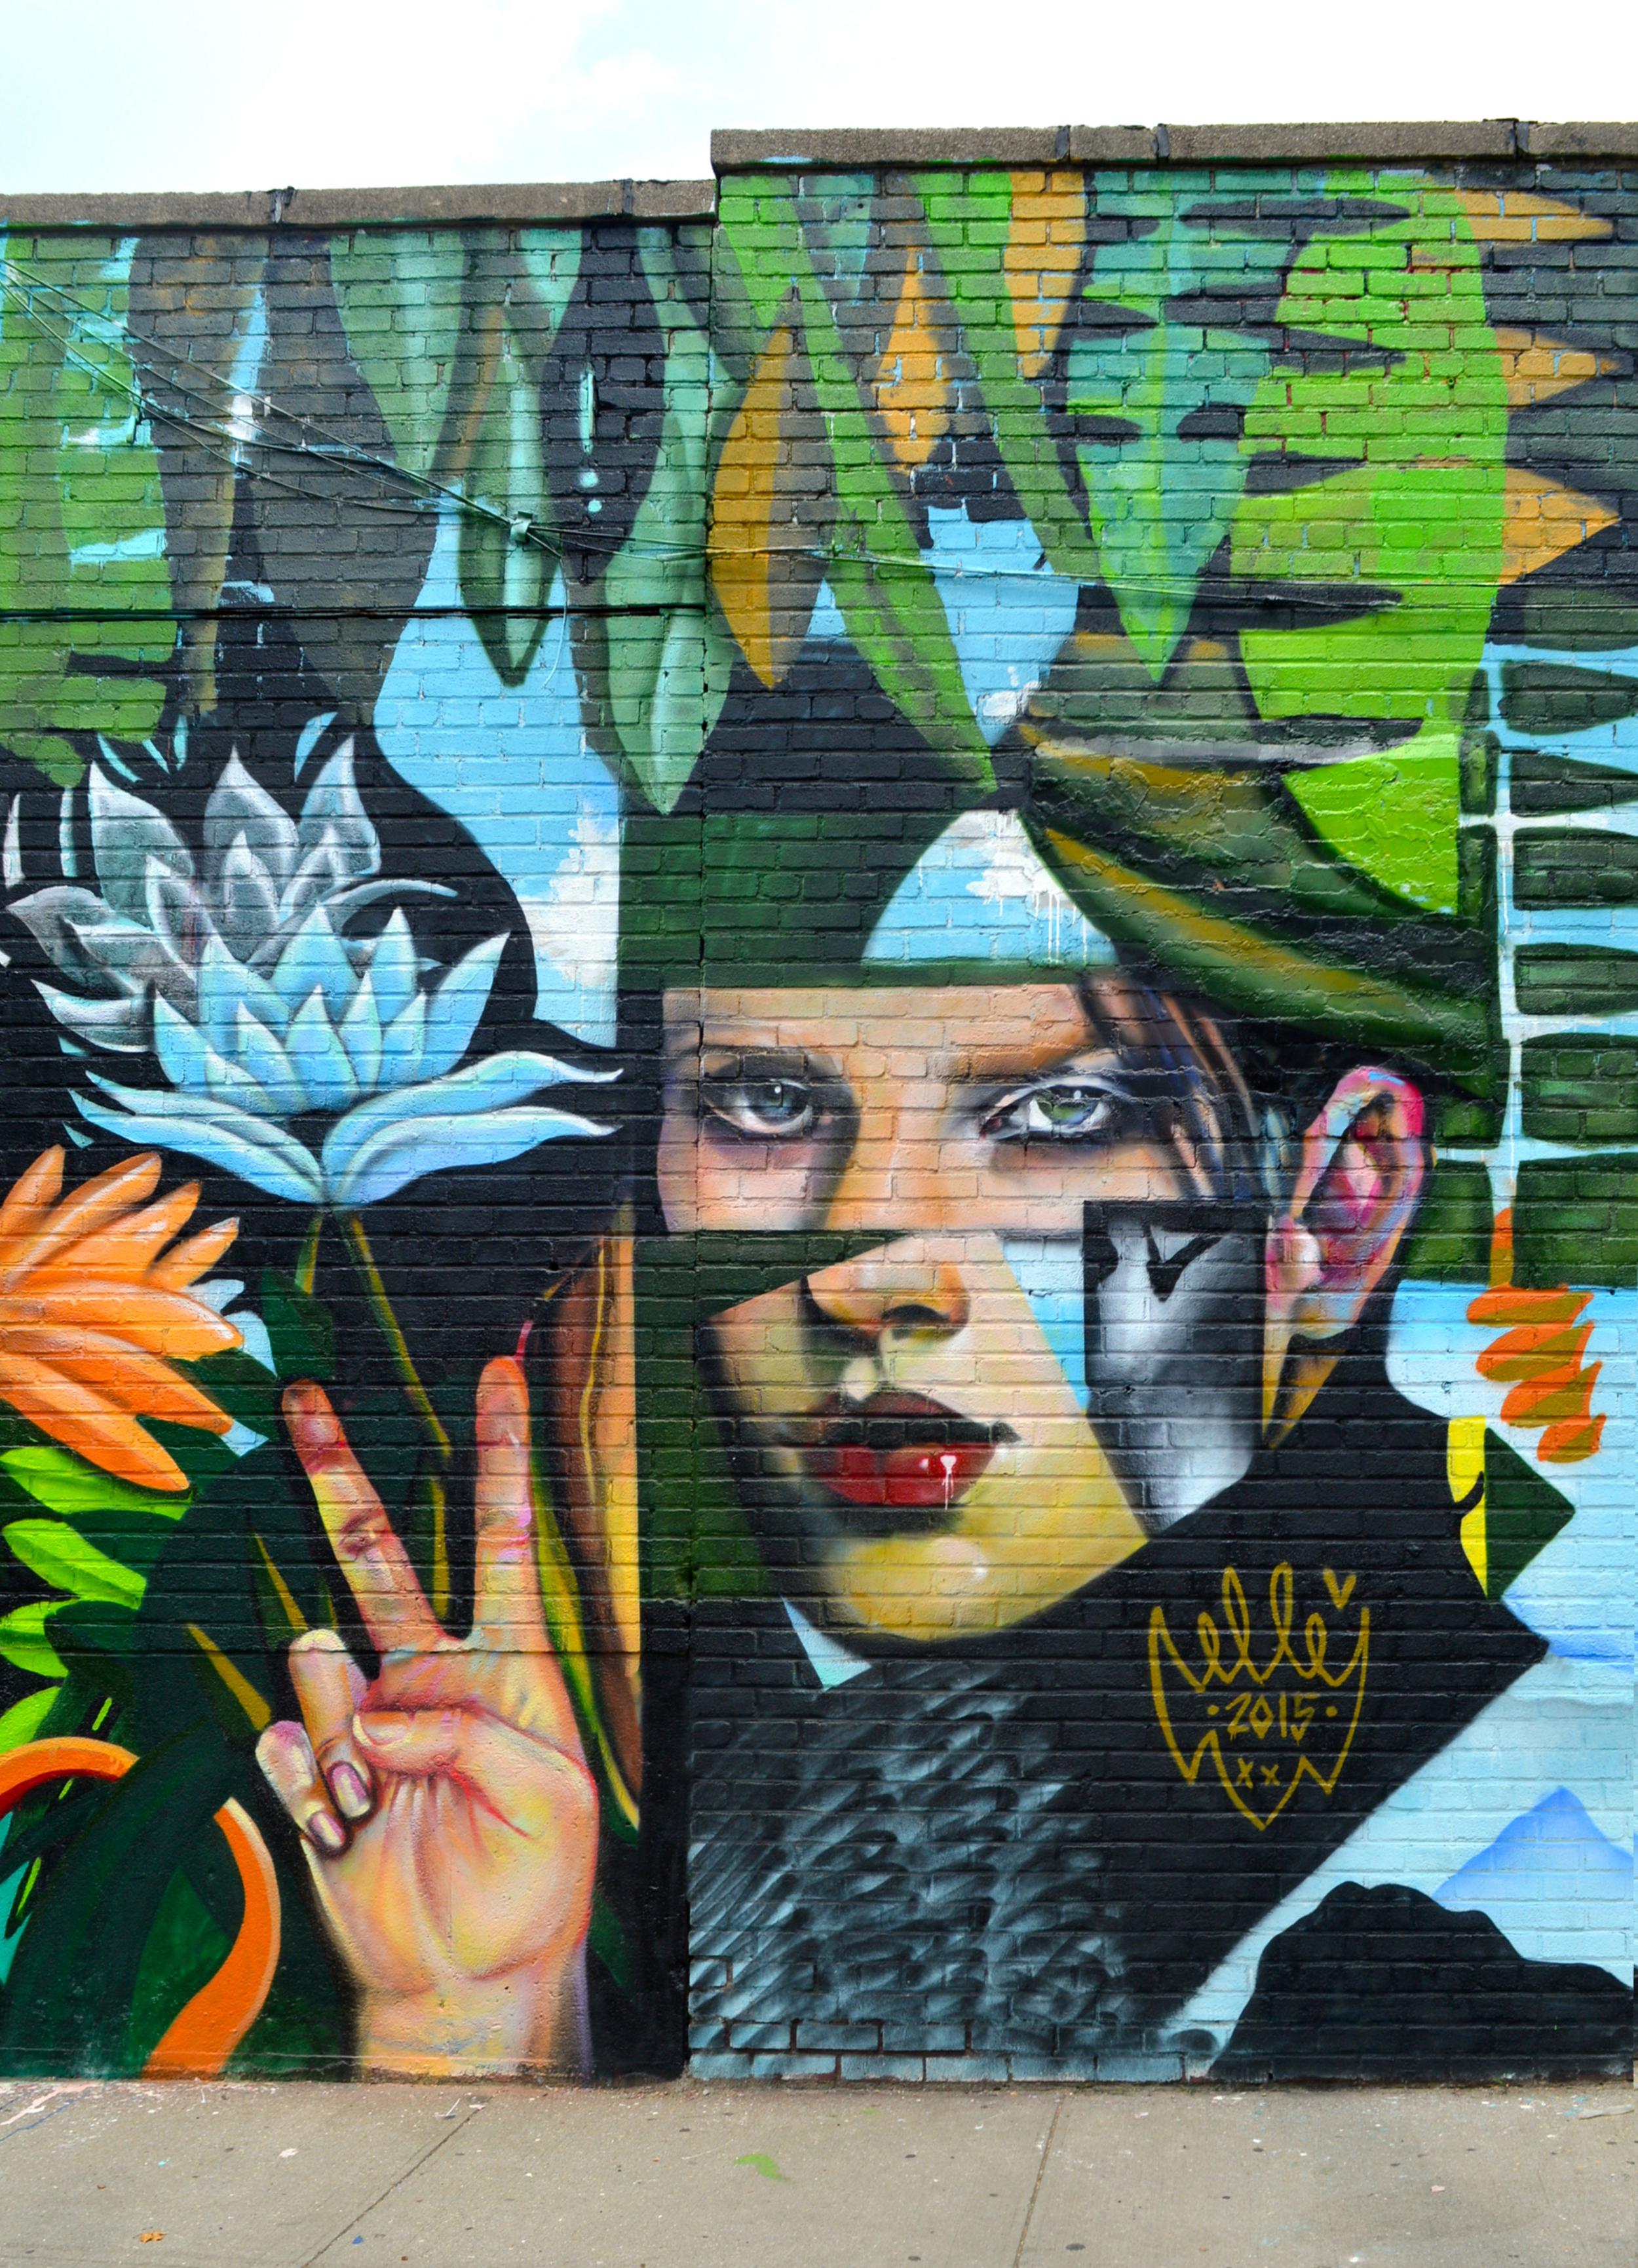 DSC_0184 straight mona piece-a by Leanne Art and Fashion.jpg